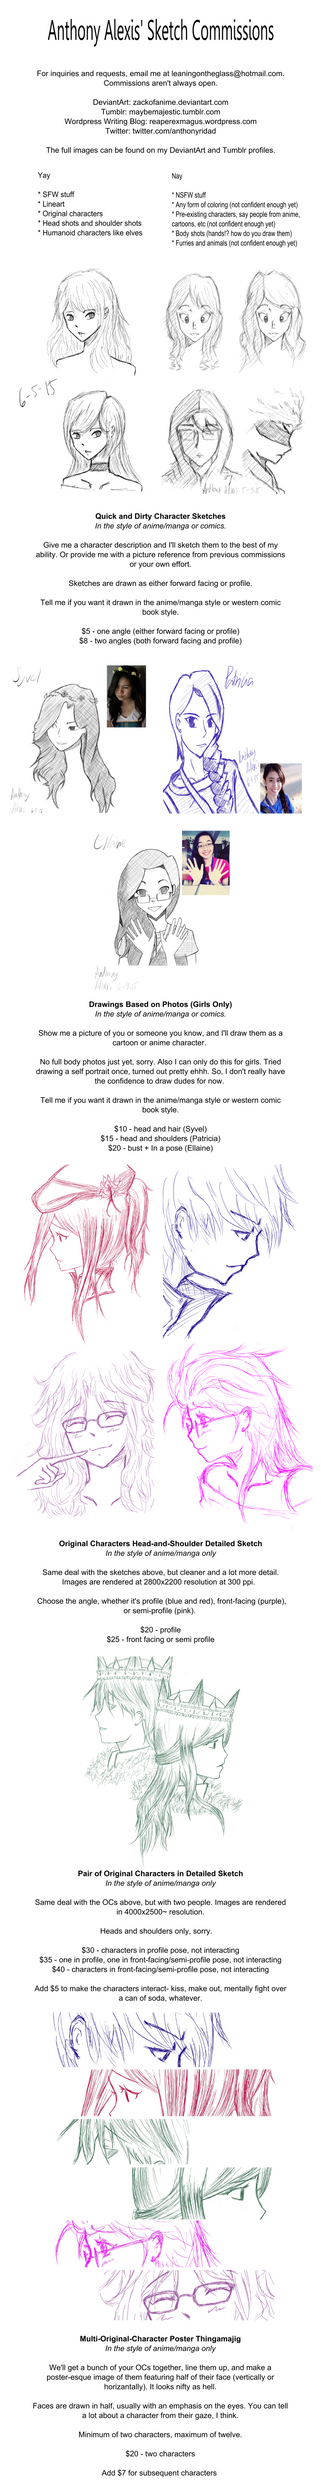 Sketch Commissions Info by zackofanime